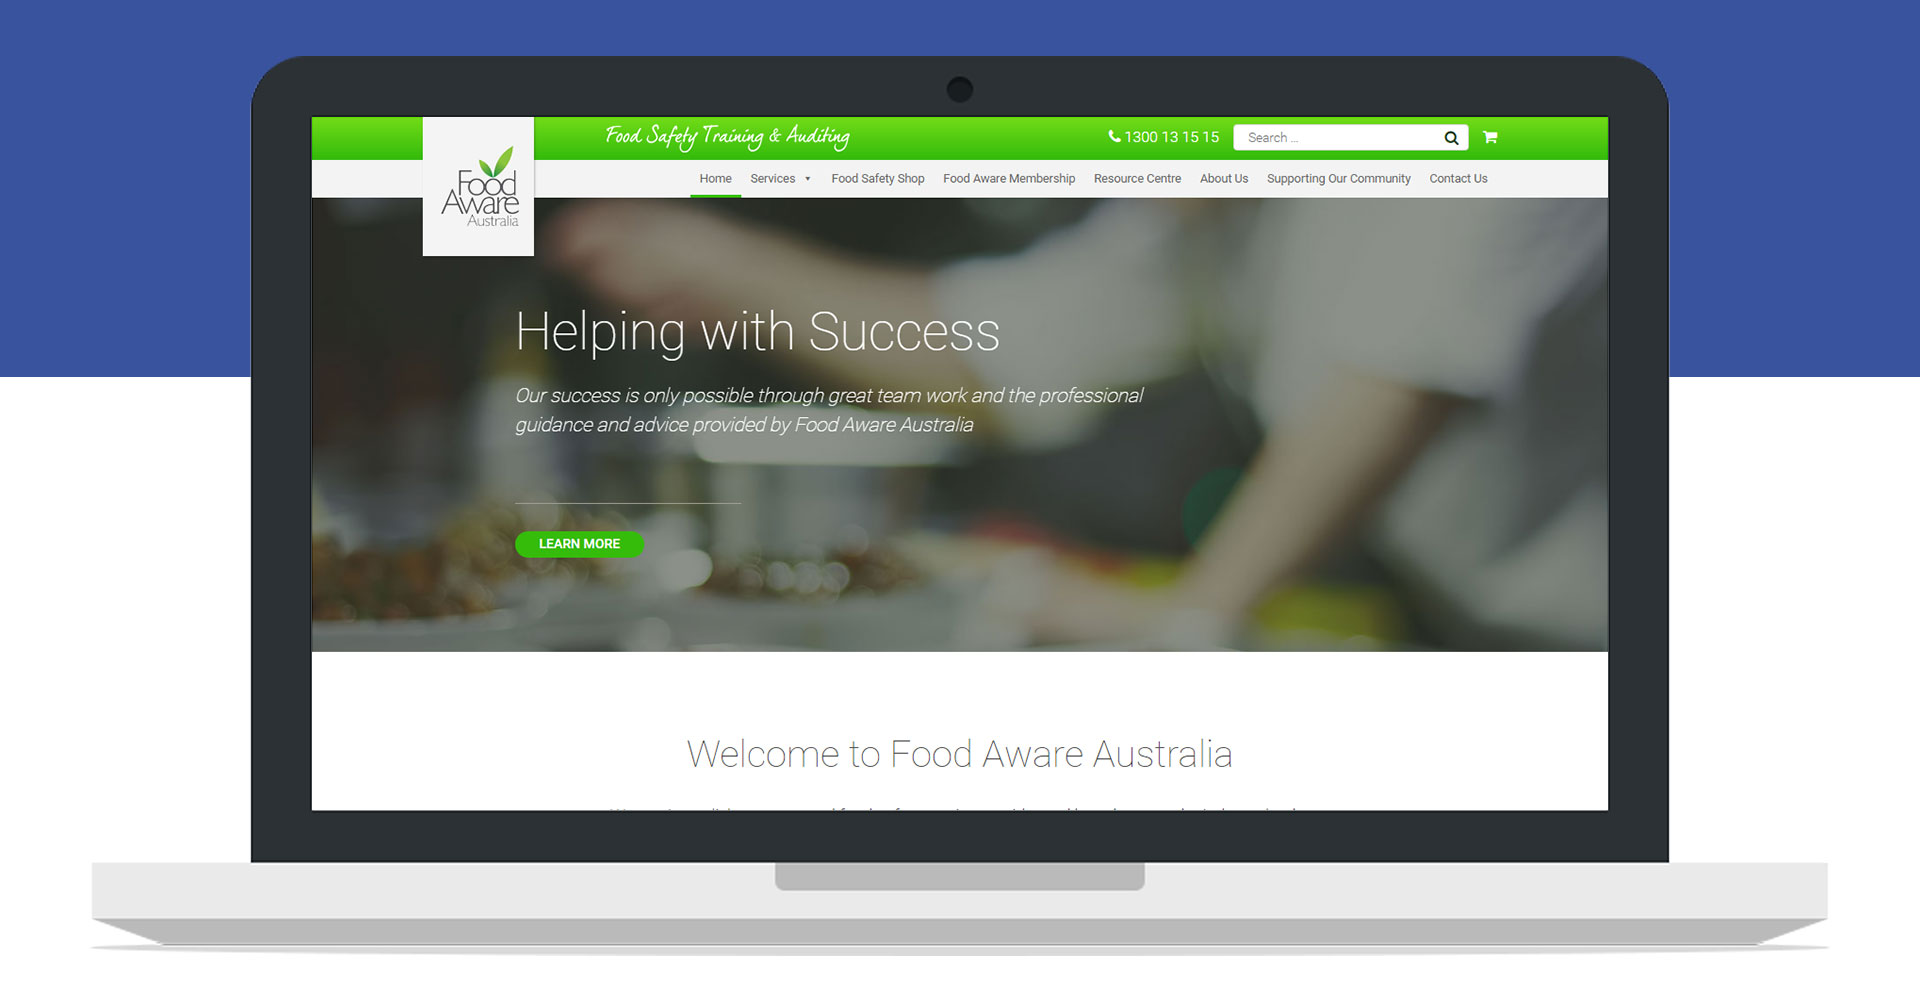 Food Aware Australia